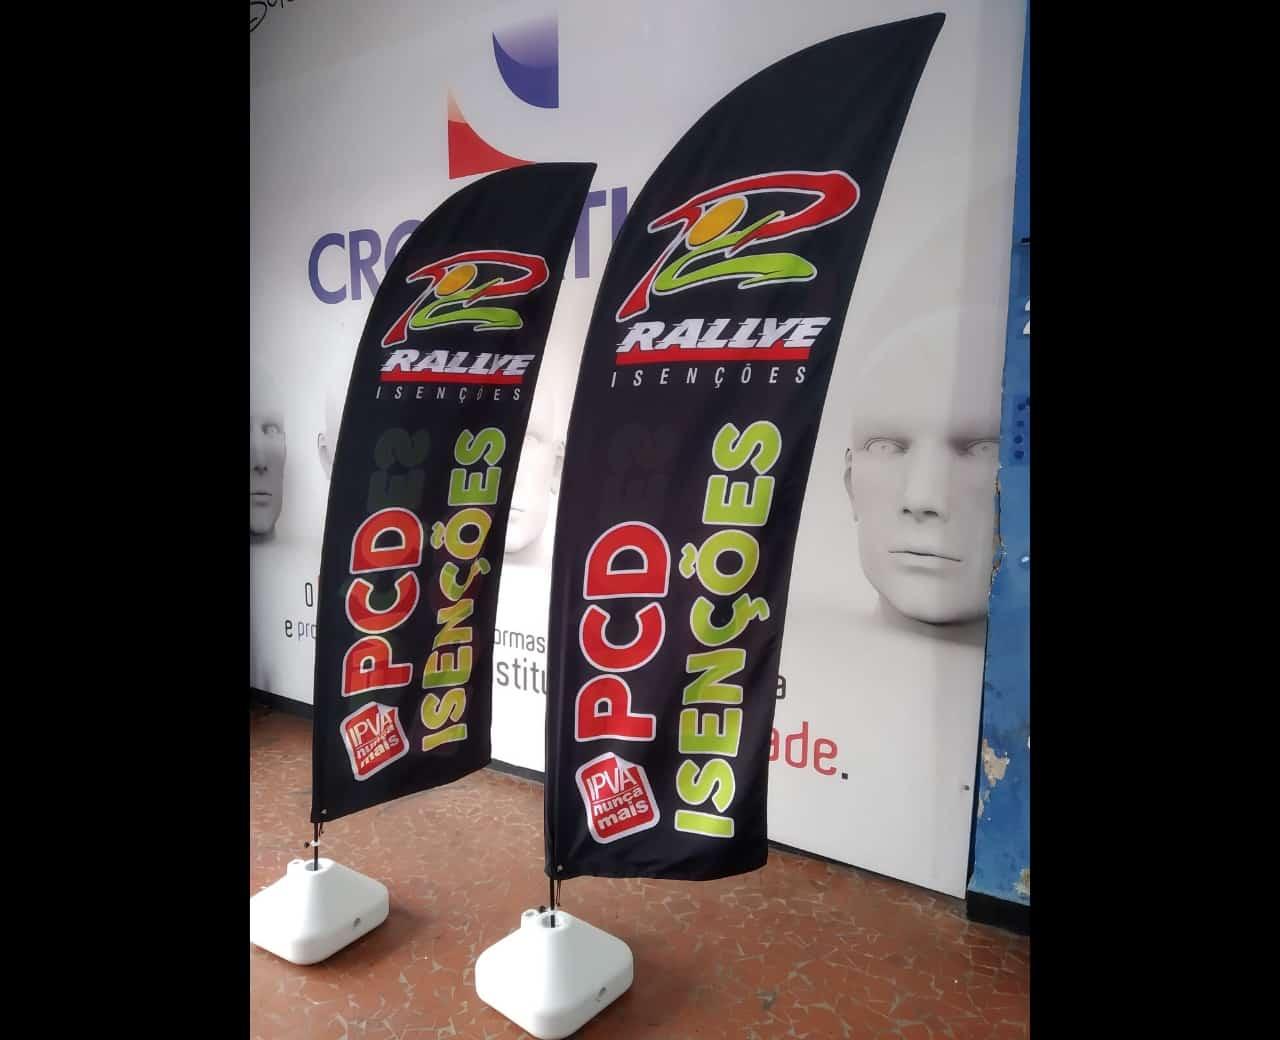 WindFlag - Rallye